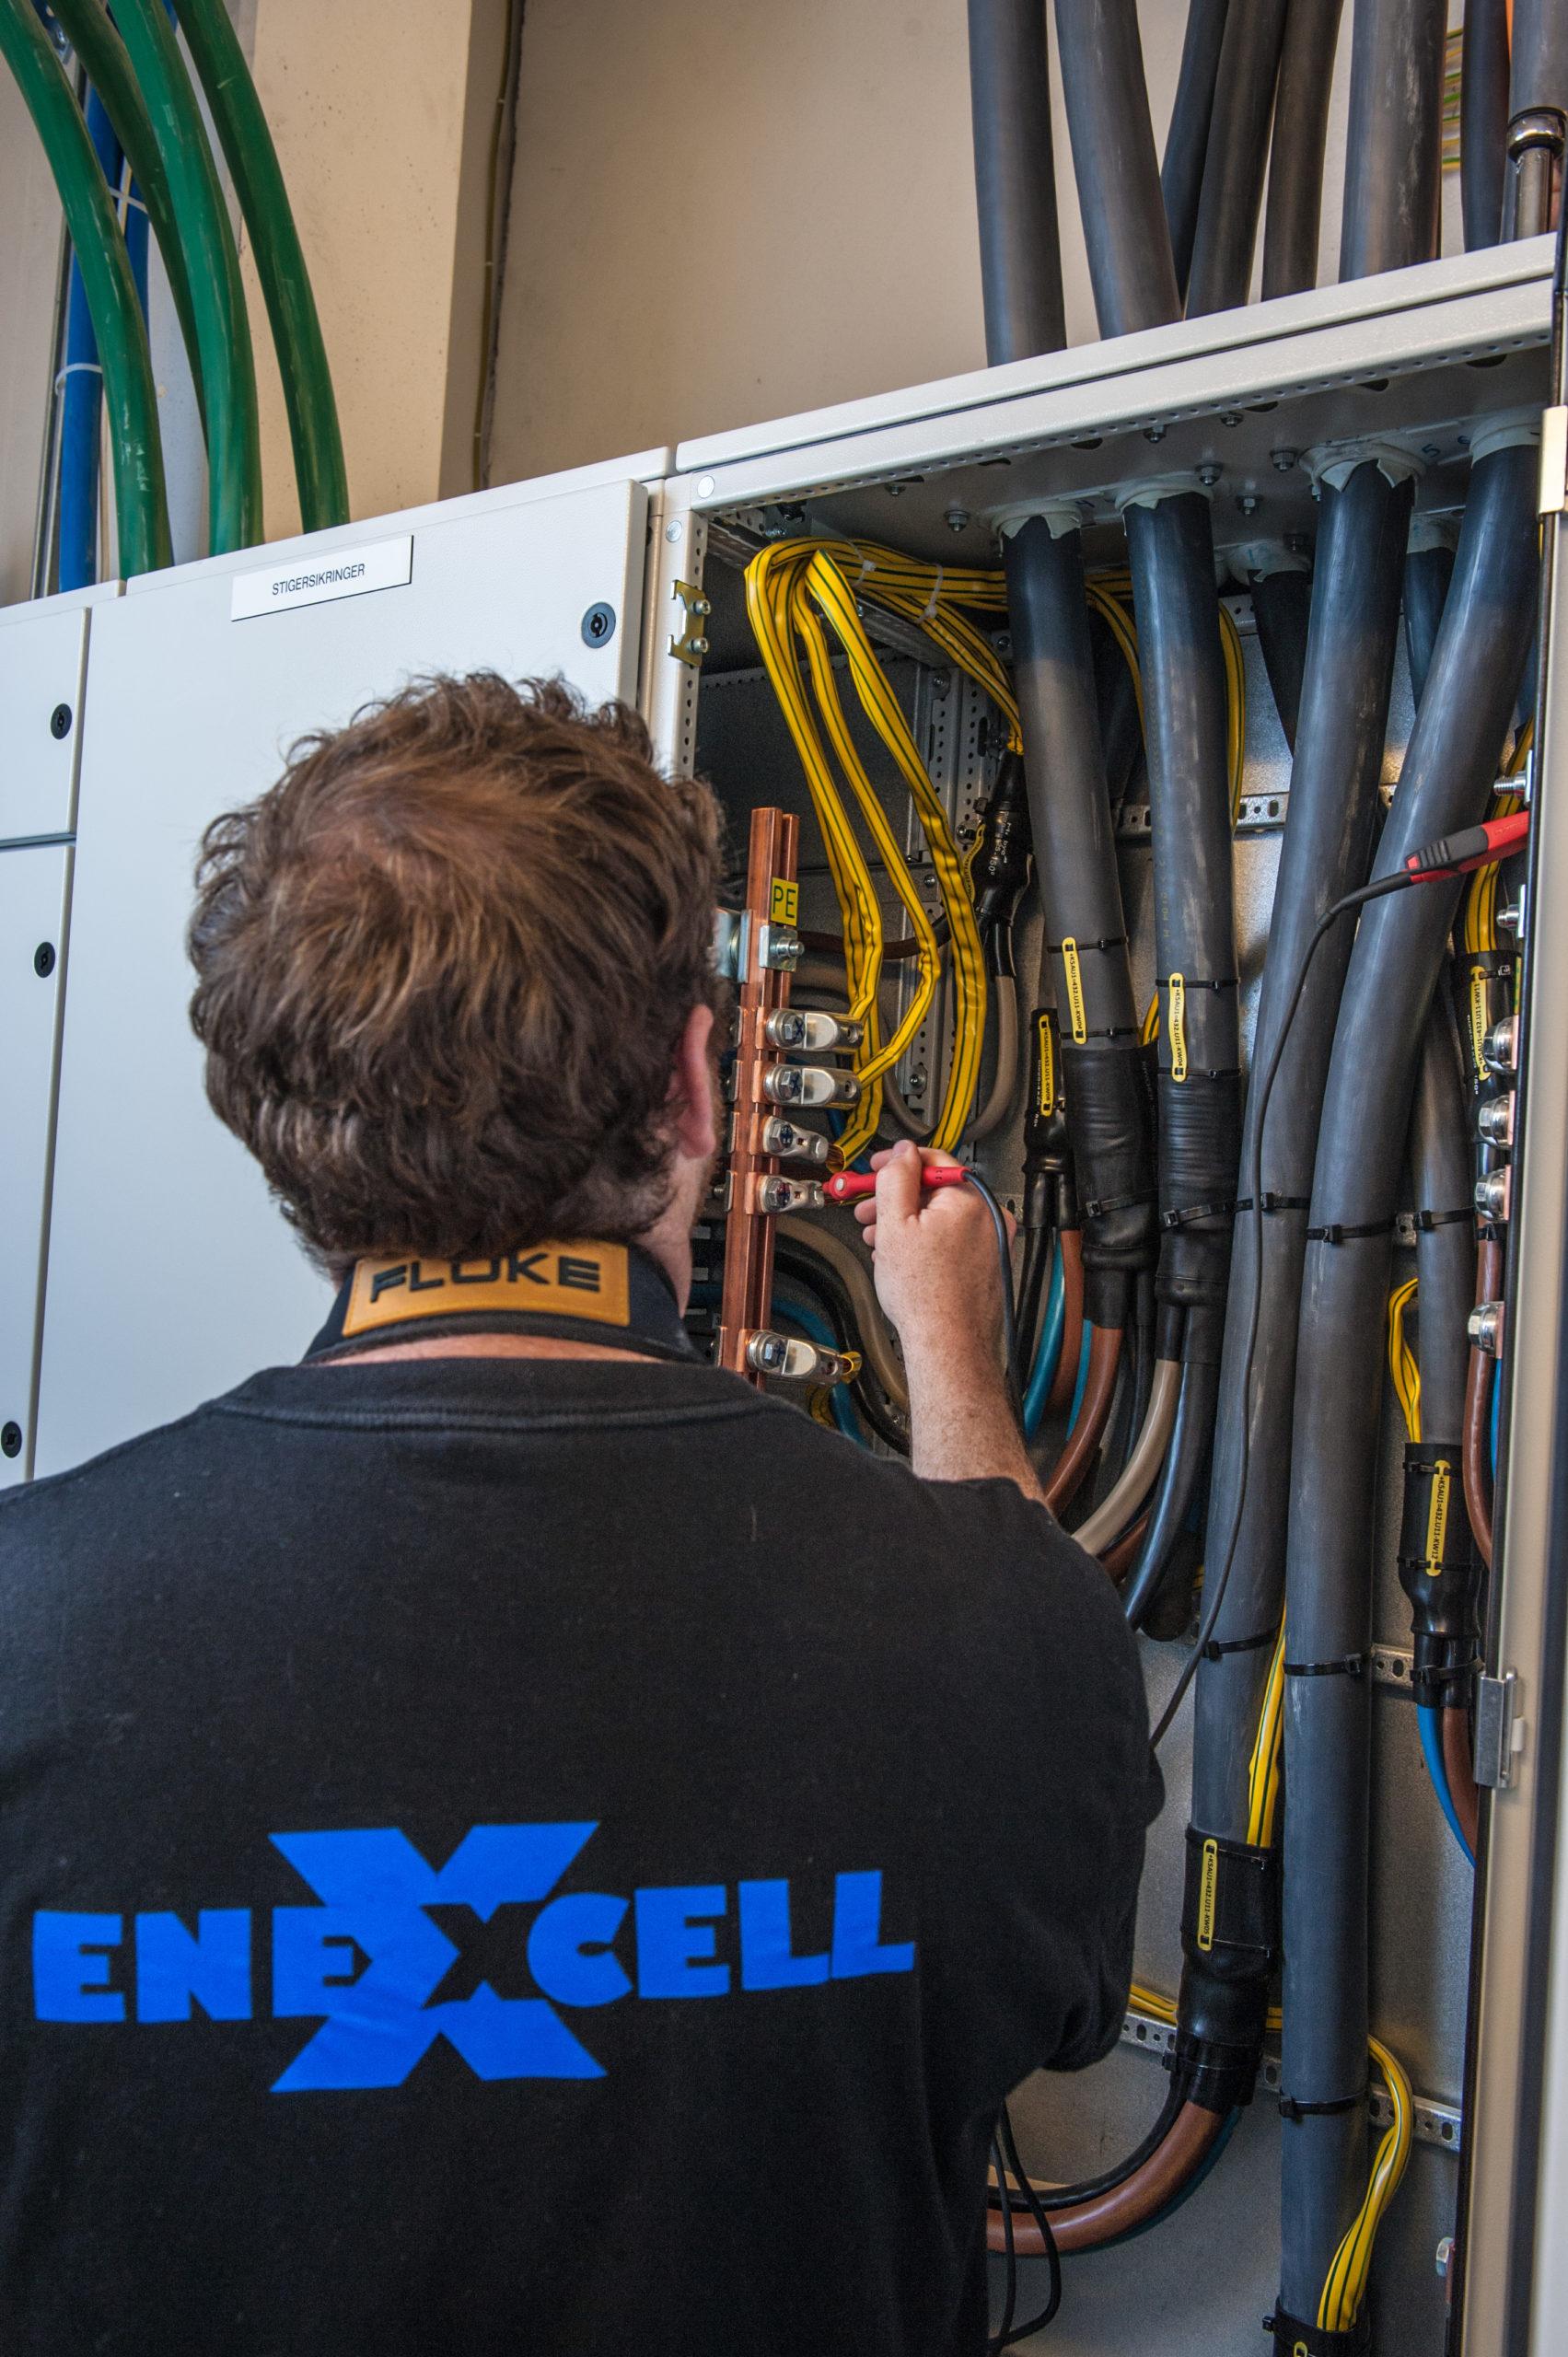 bilde av elektriker som kontrollerer el skap